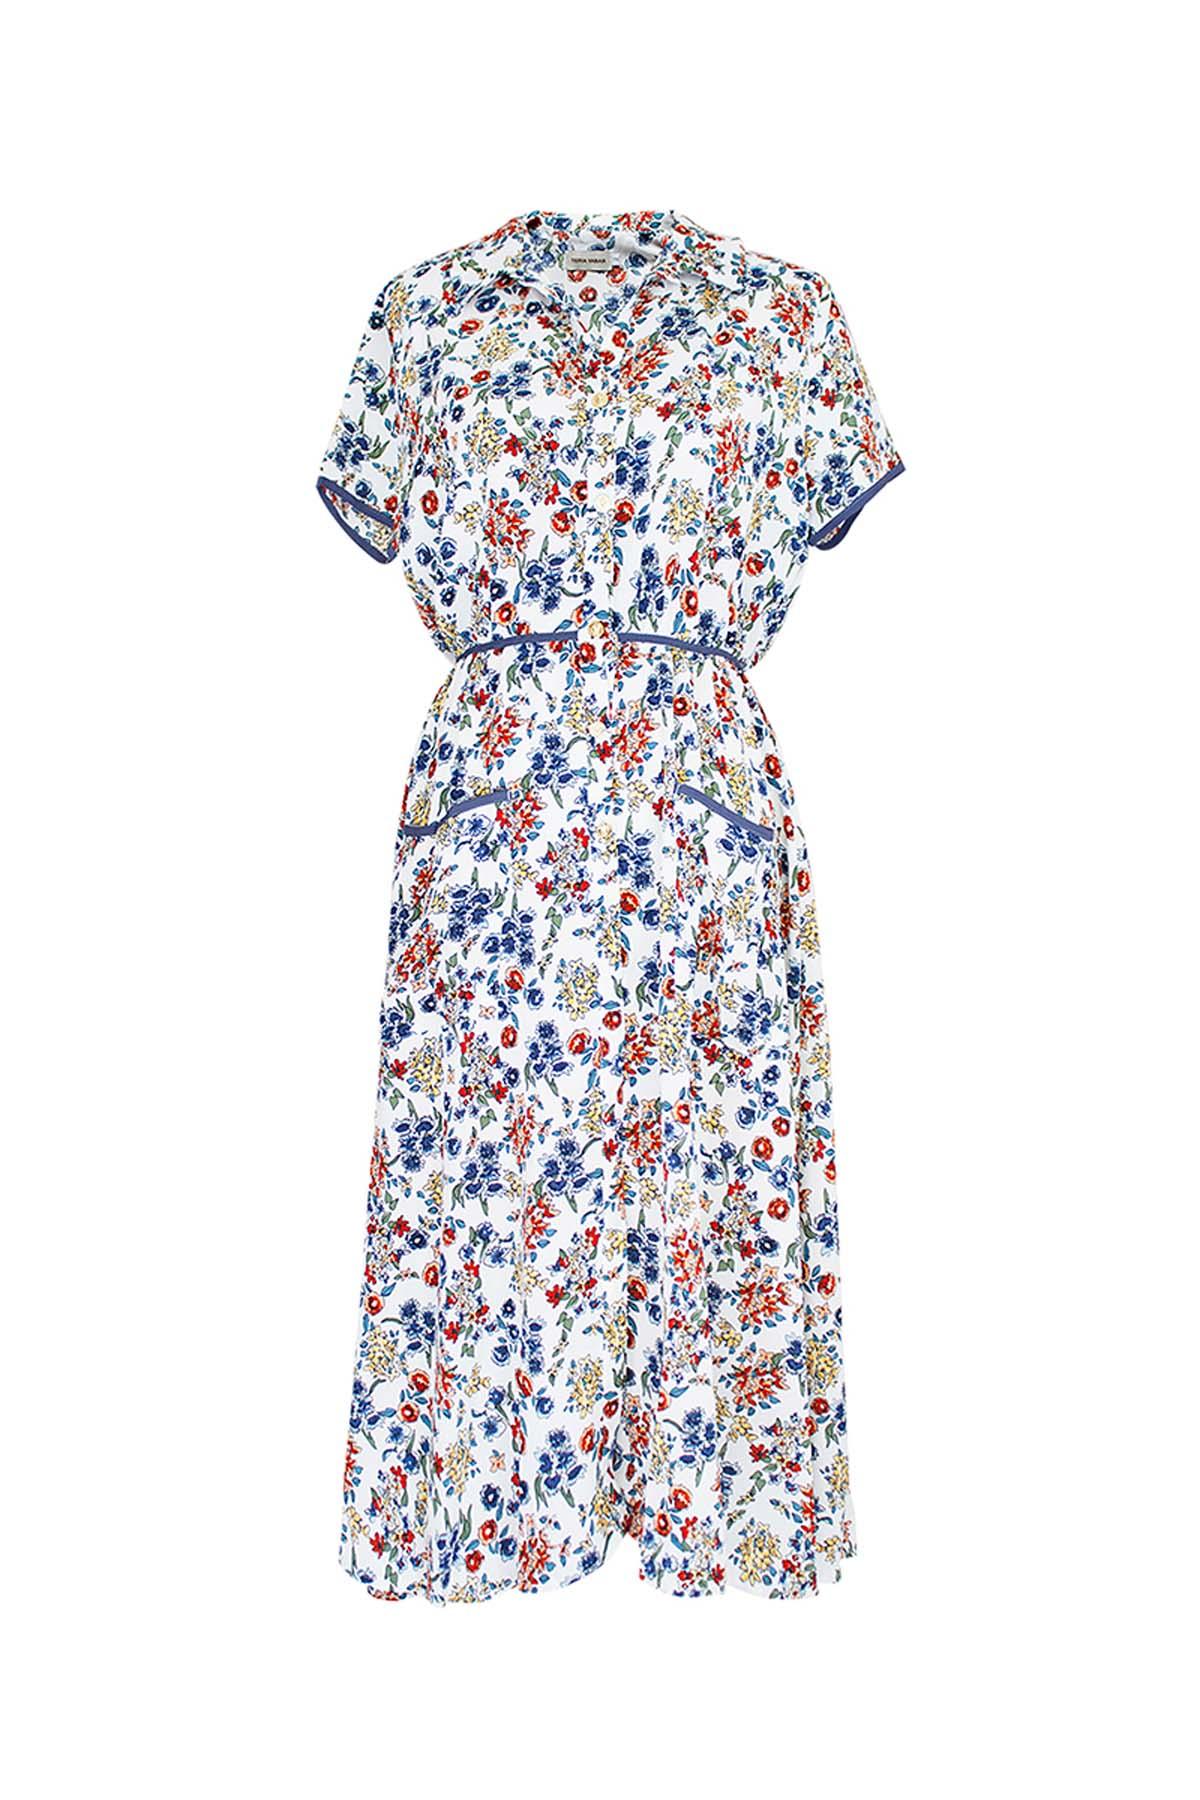 Teria Yabar - Vestido tea dress white